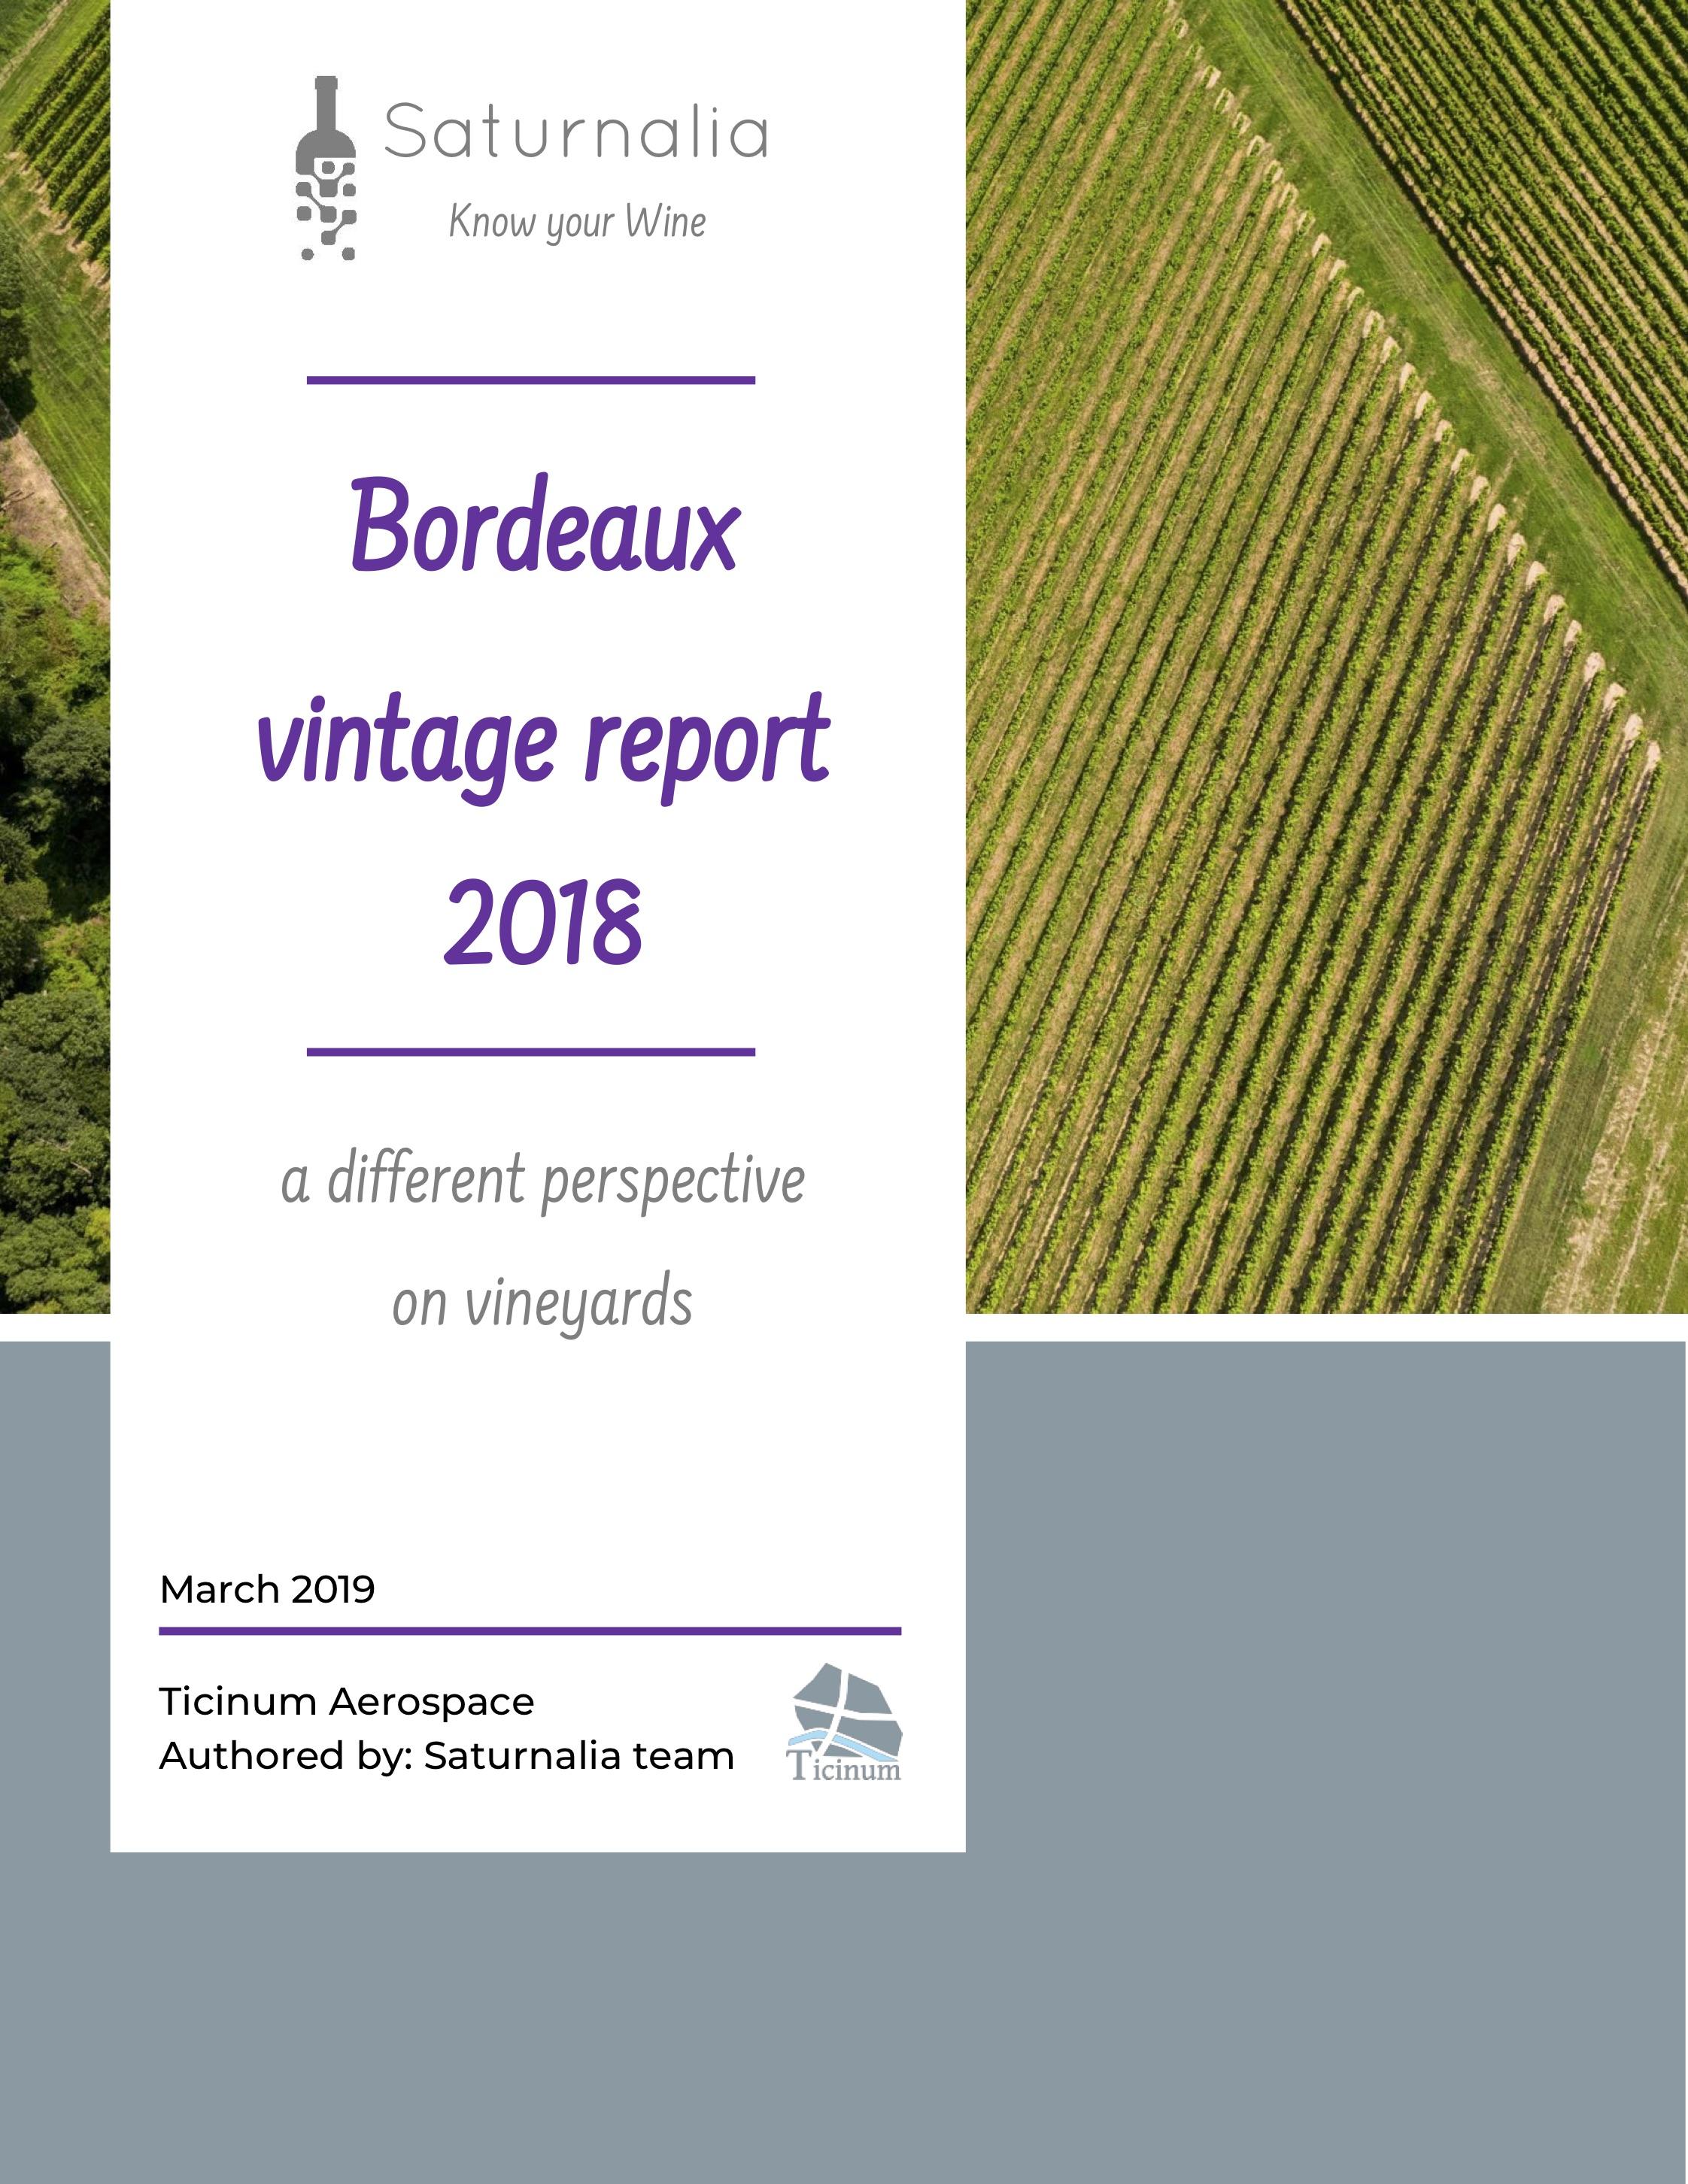 Bordeaux-2018-vintage-report-saturnalia.jpg